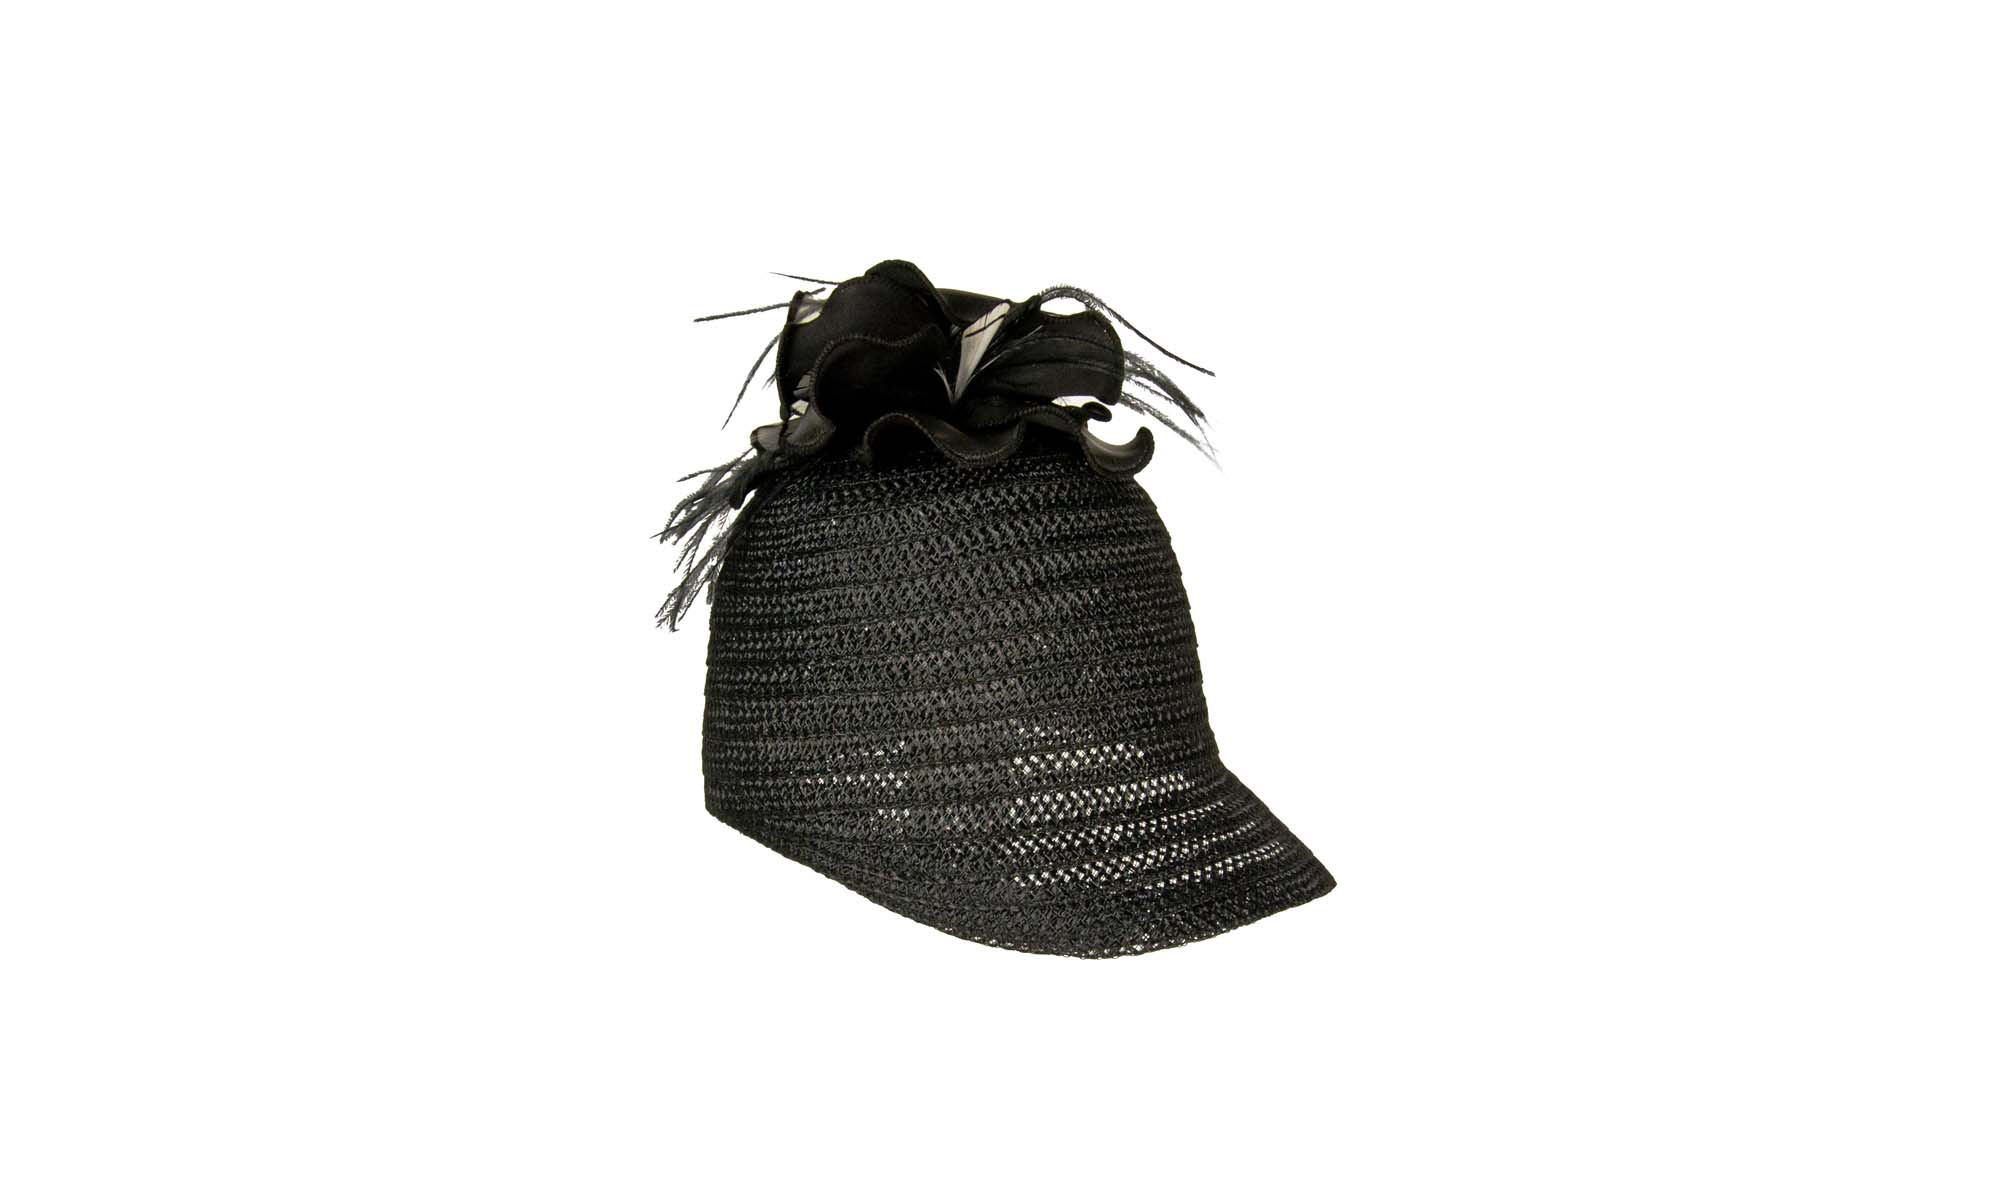 HORSE SS16 Crine eco-Leather Flower Black